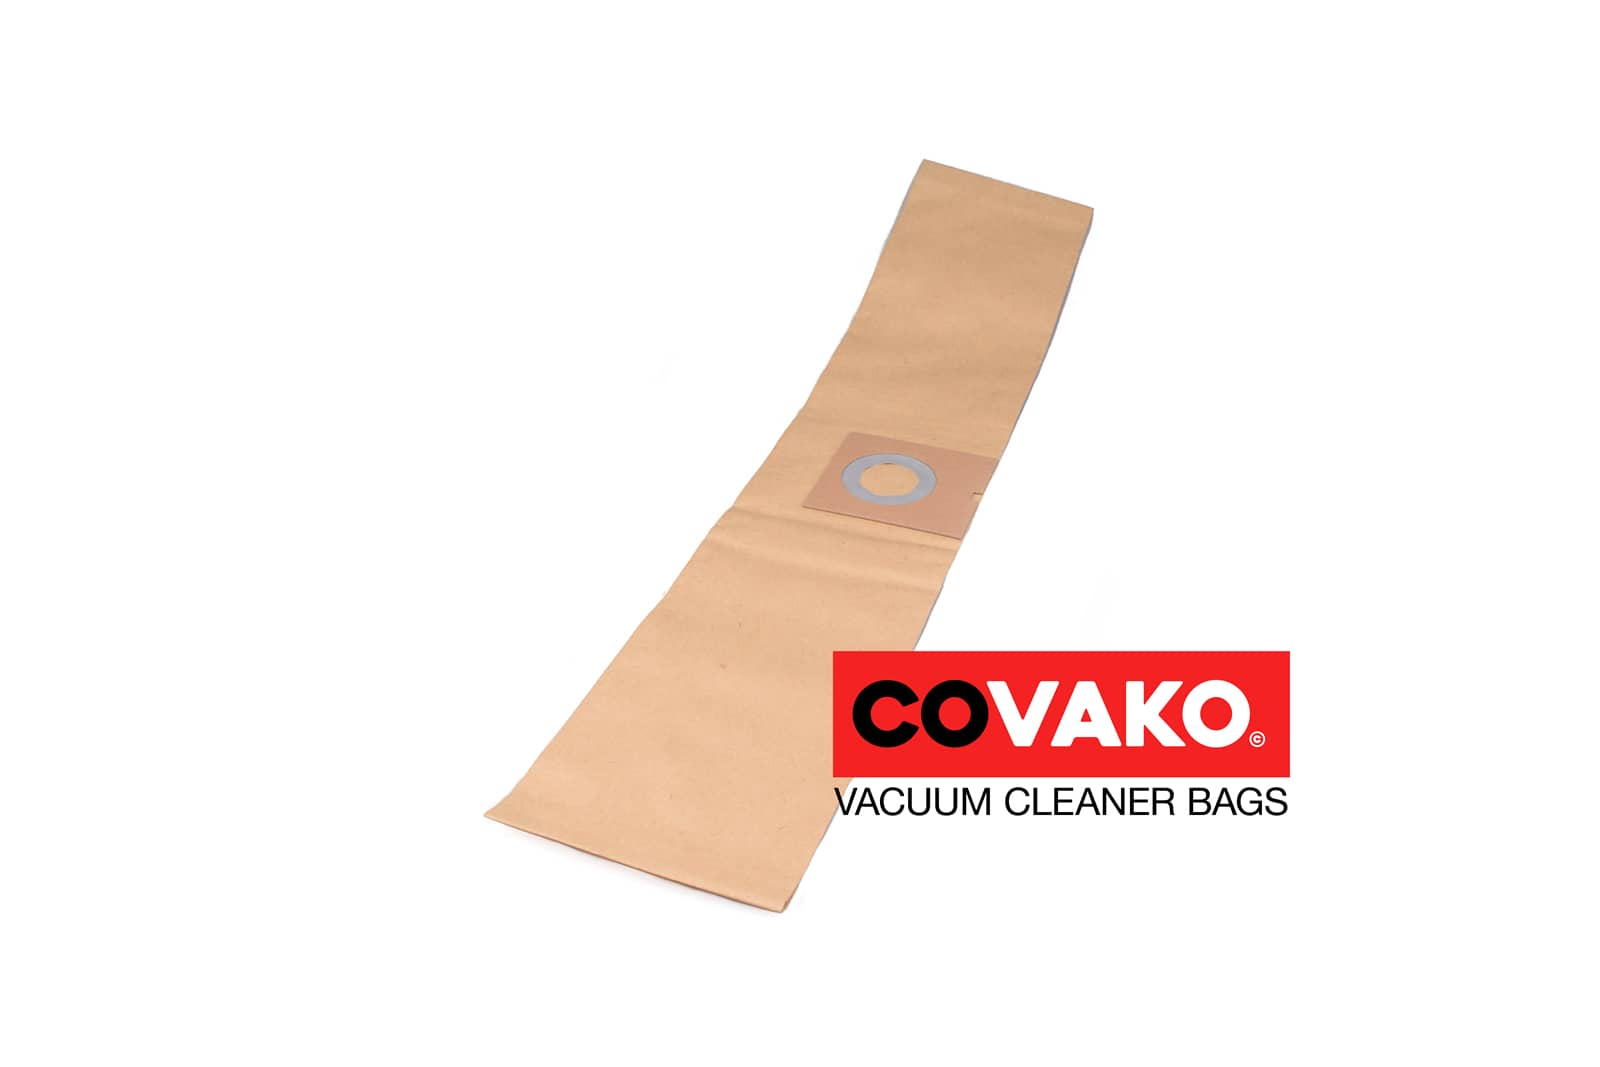 Kärcher T 101 / Paper - Kärcher vacuum cleaner bags